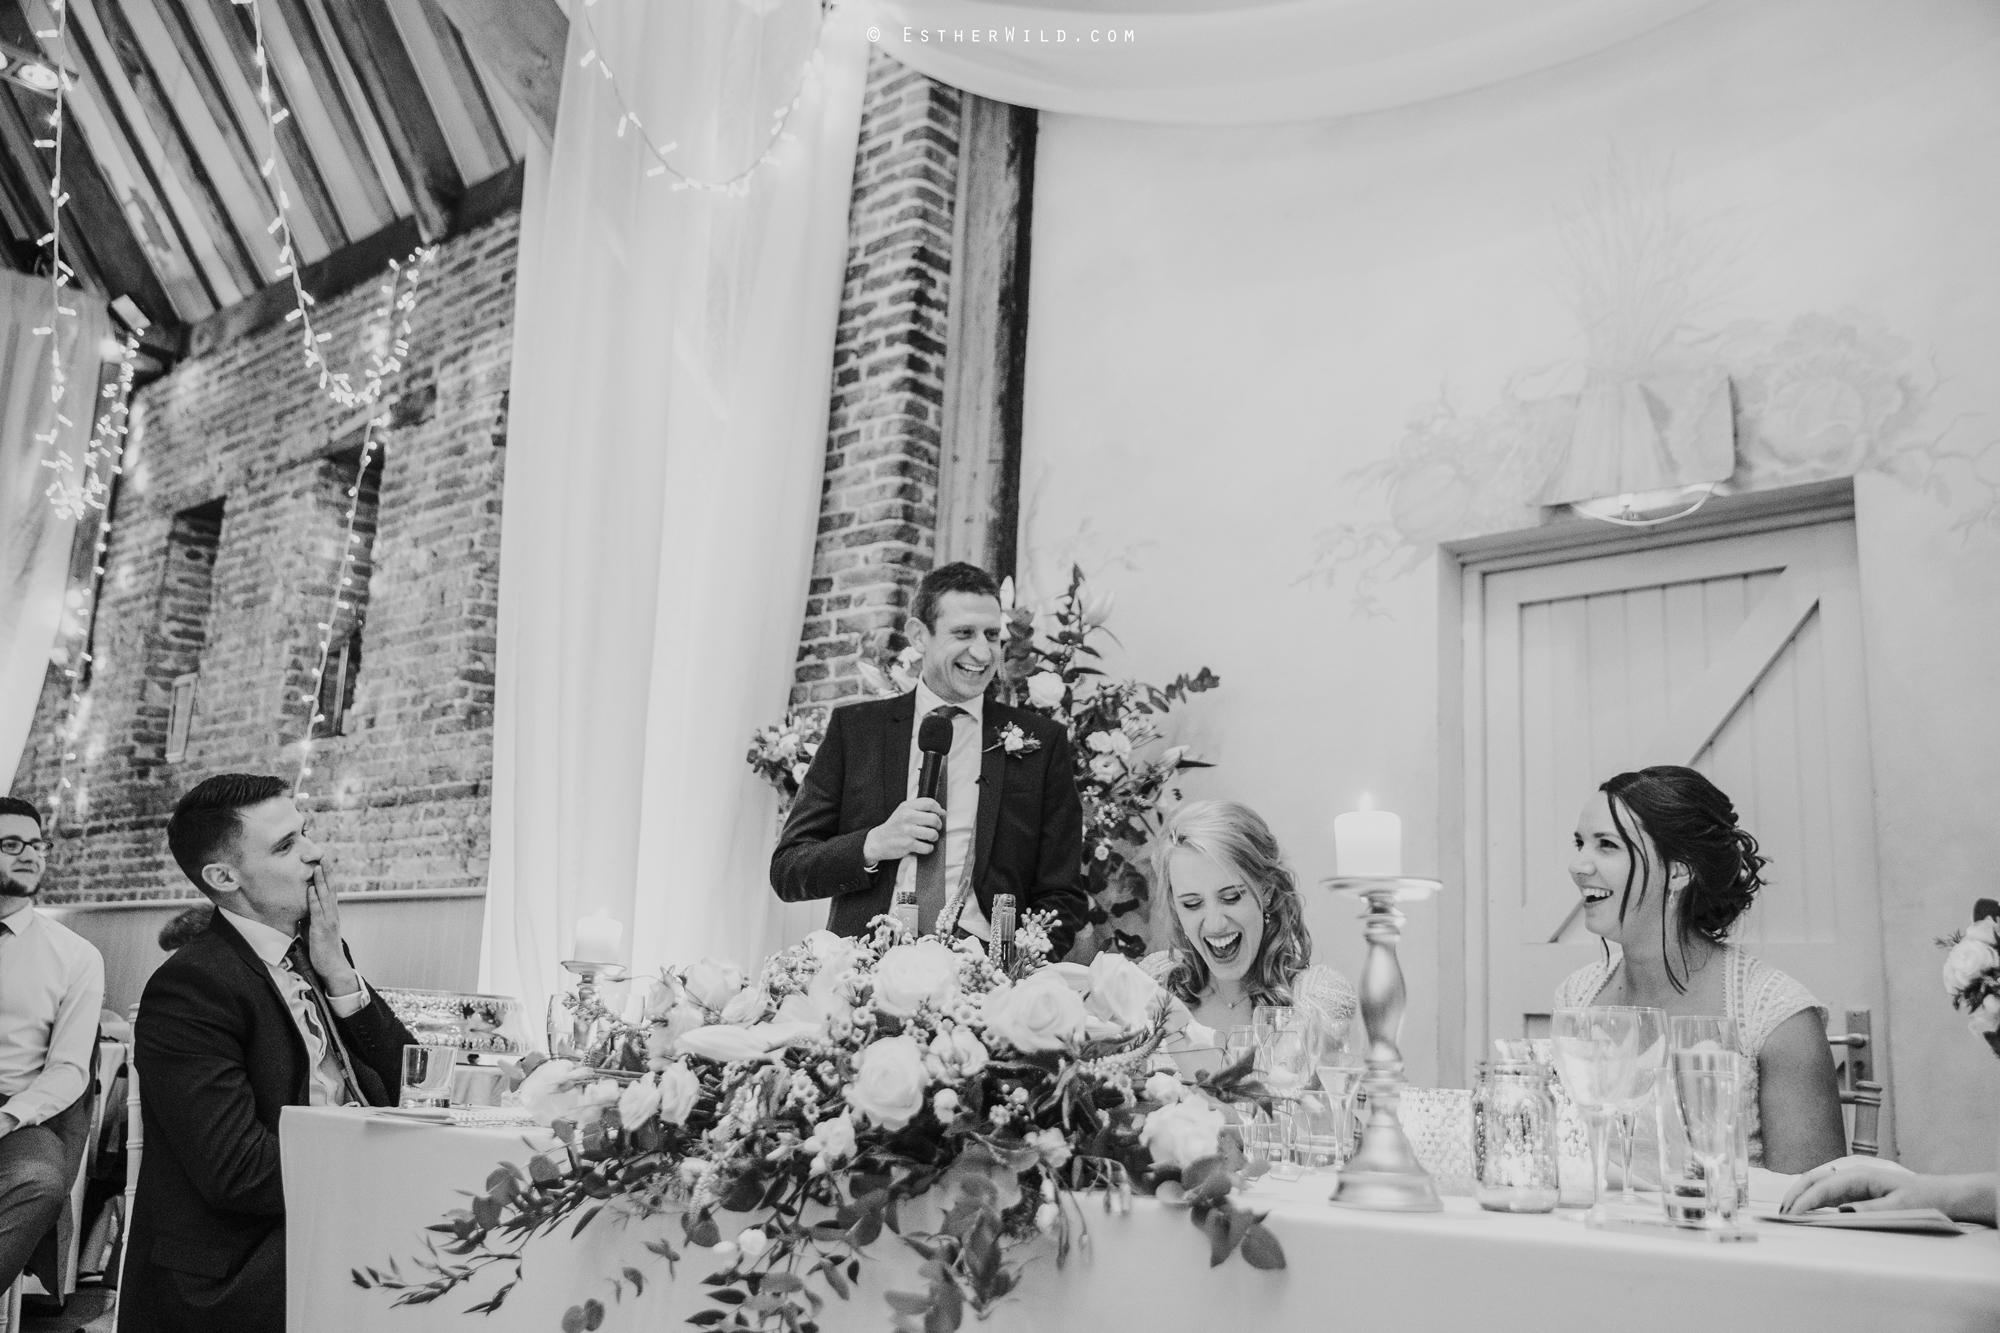 Elms_Barn_Weddings_Suffolk_Photographer_Copyright_Esther_Wild_IMG_2668-2.jpg